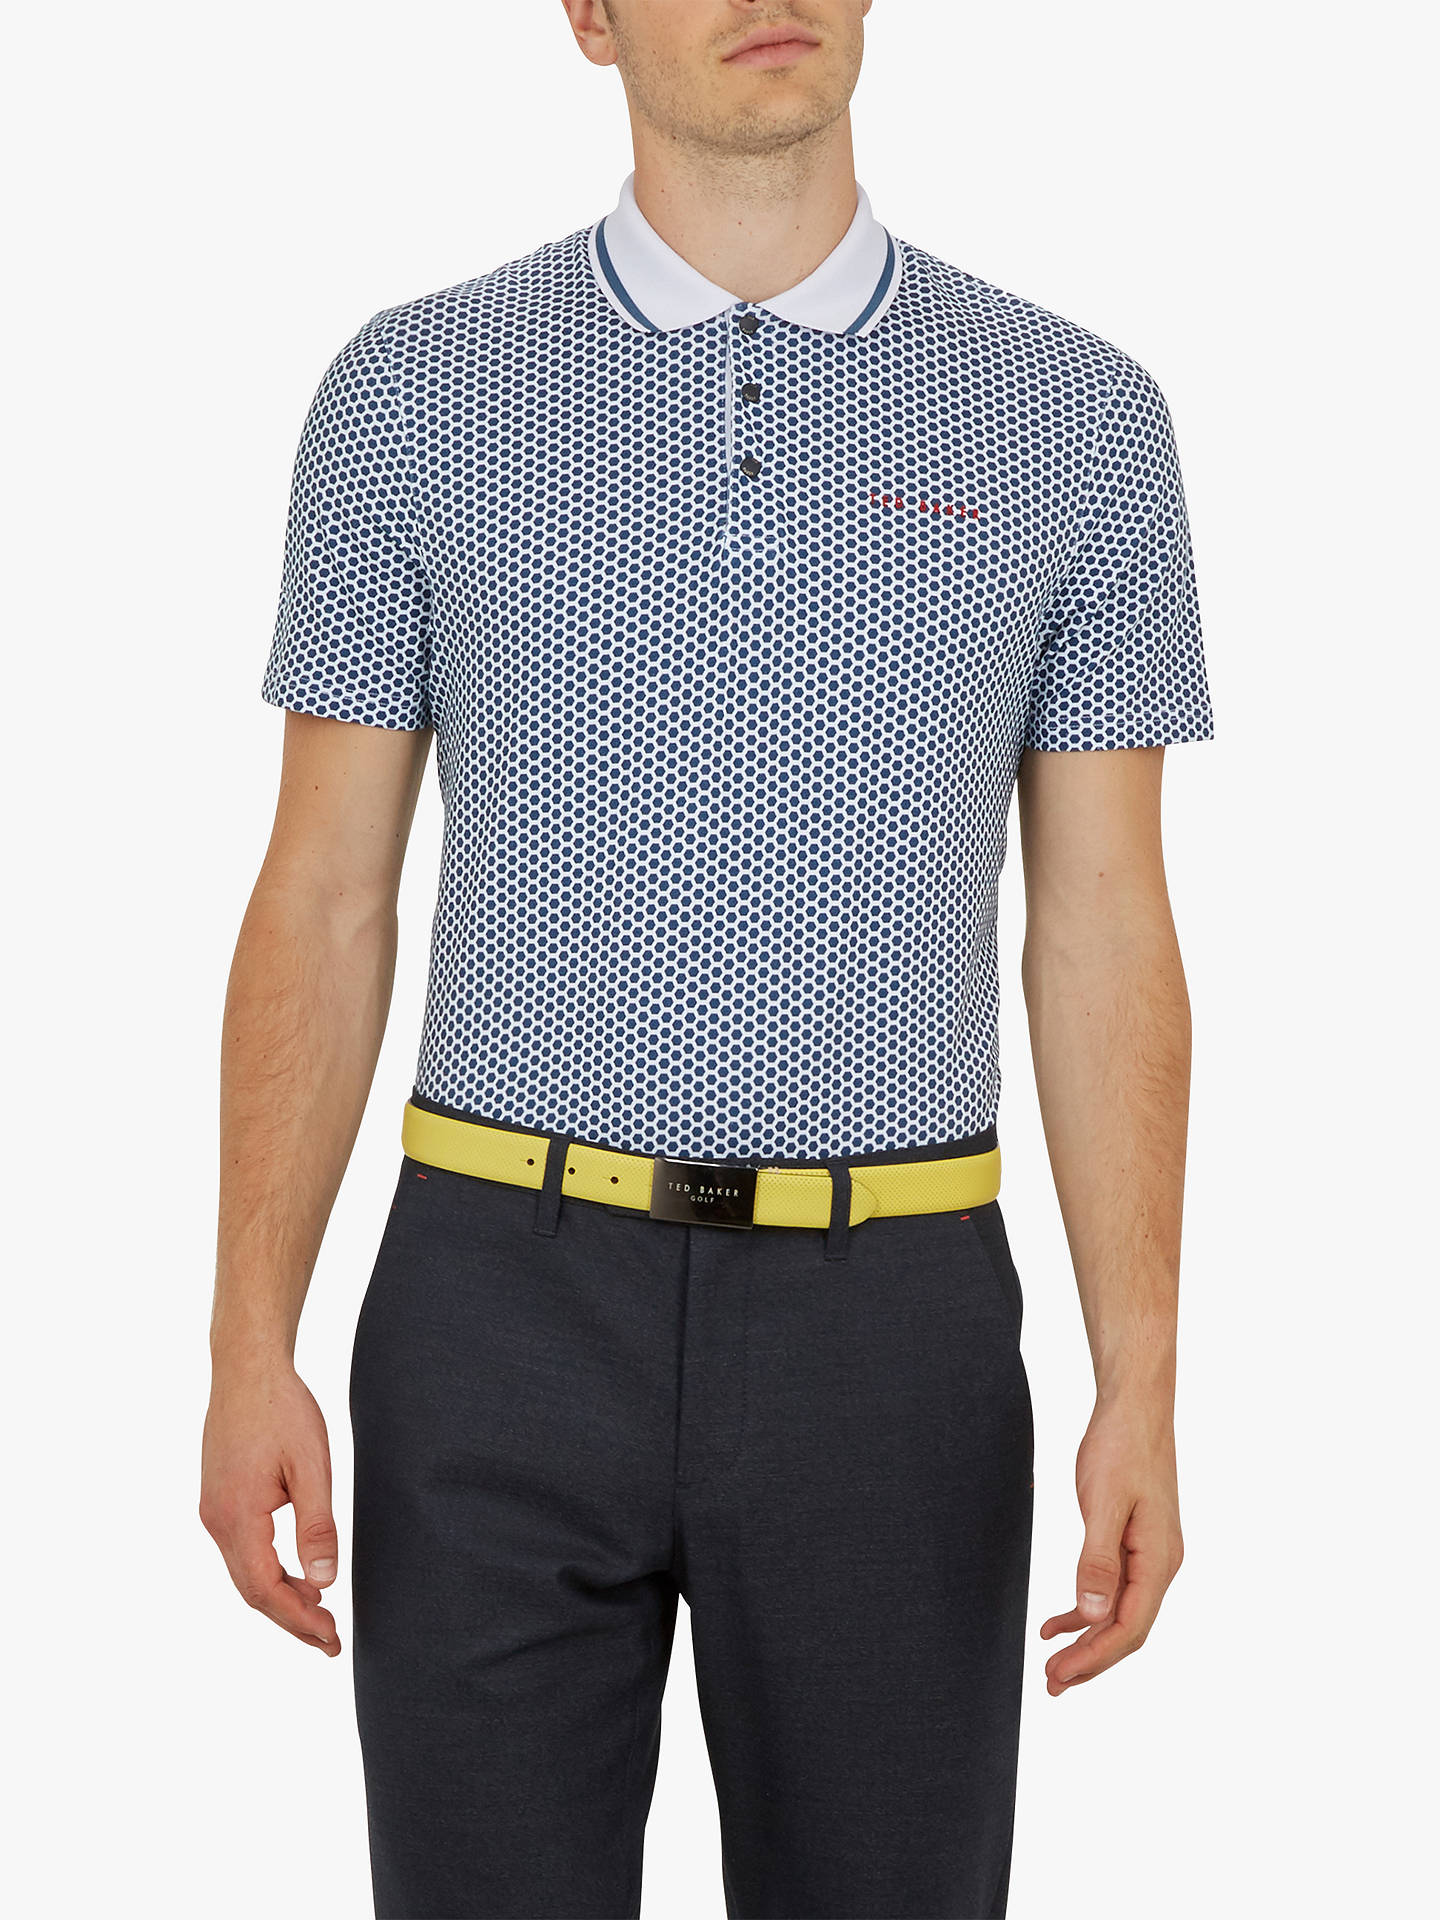 75cda6582e447c Ted Baker Golf Erine Hexagon Geo Print Polo Shirt at John Lewis ...